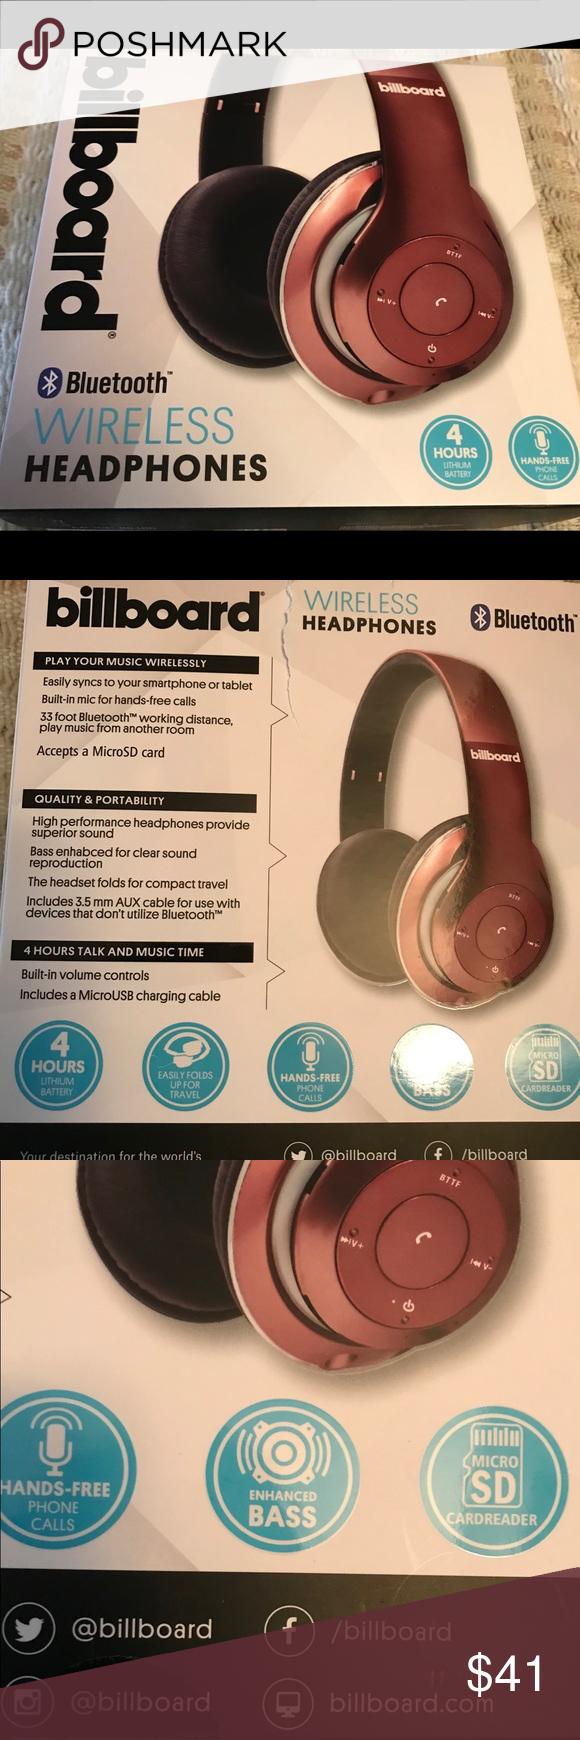 BRAND NEW Billboard bluetooth wireless headphones Rose gold